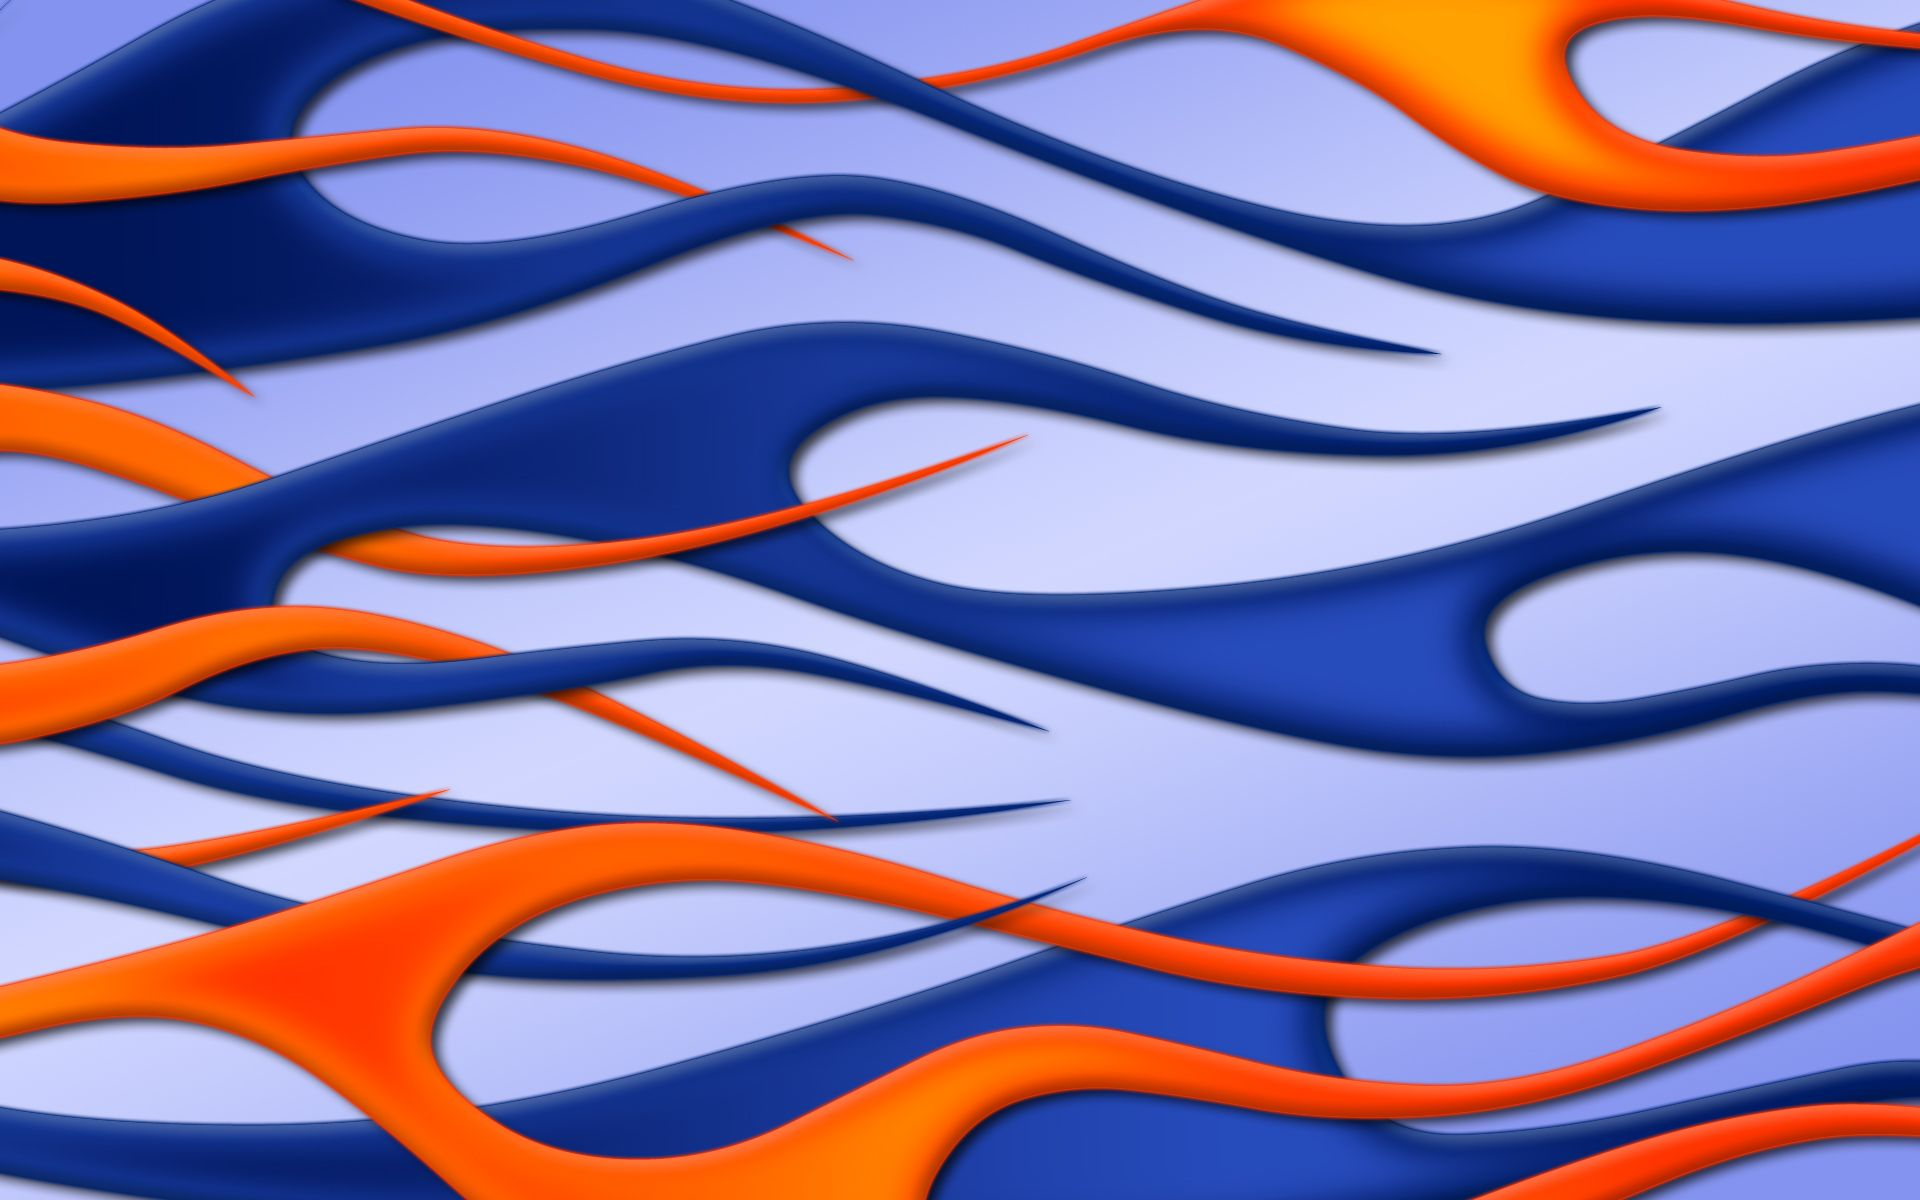 car with blue flames Flames Blue Jbensch Orange